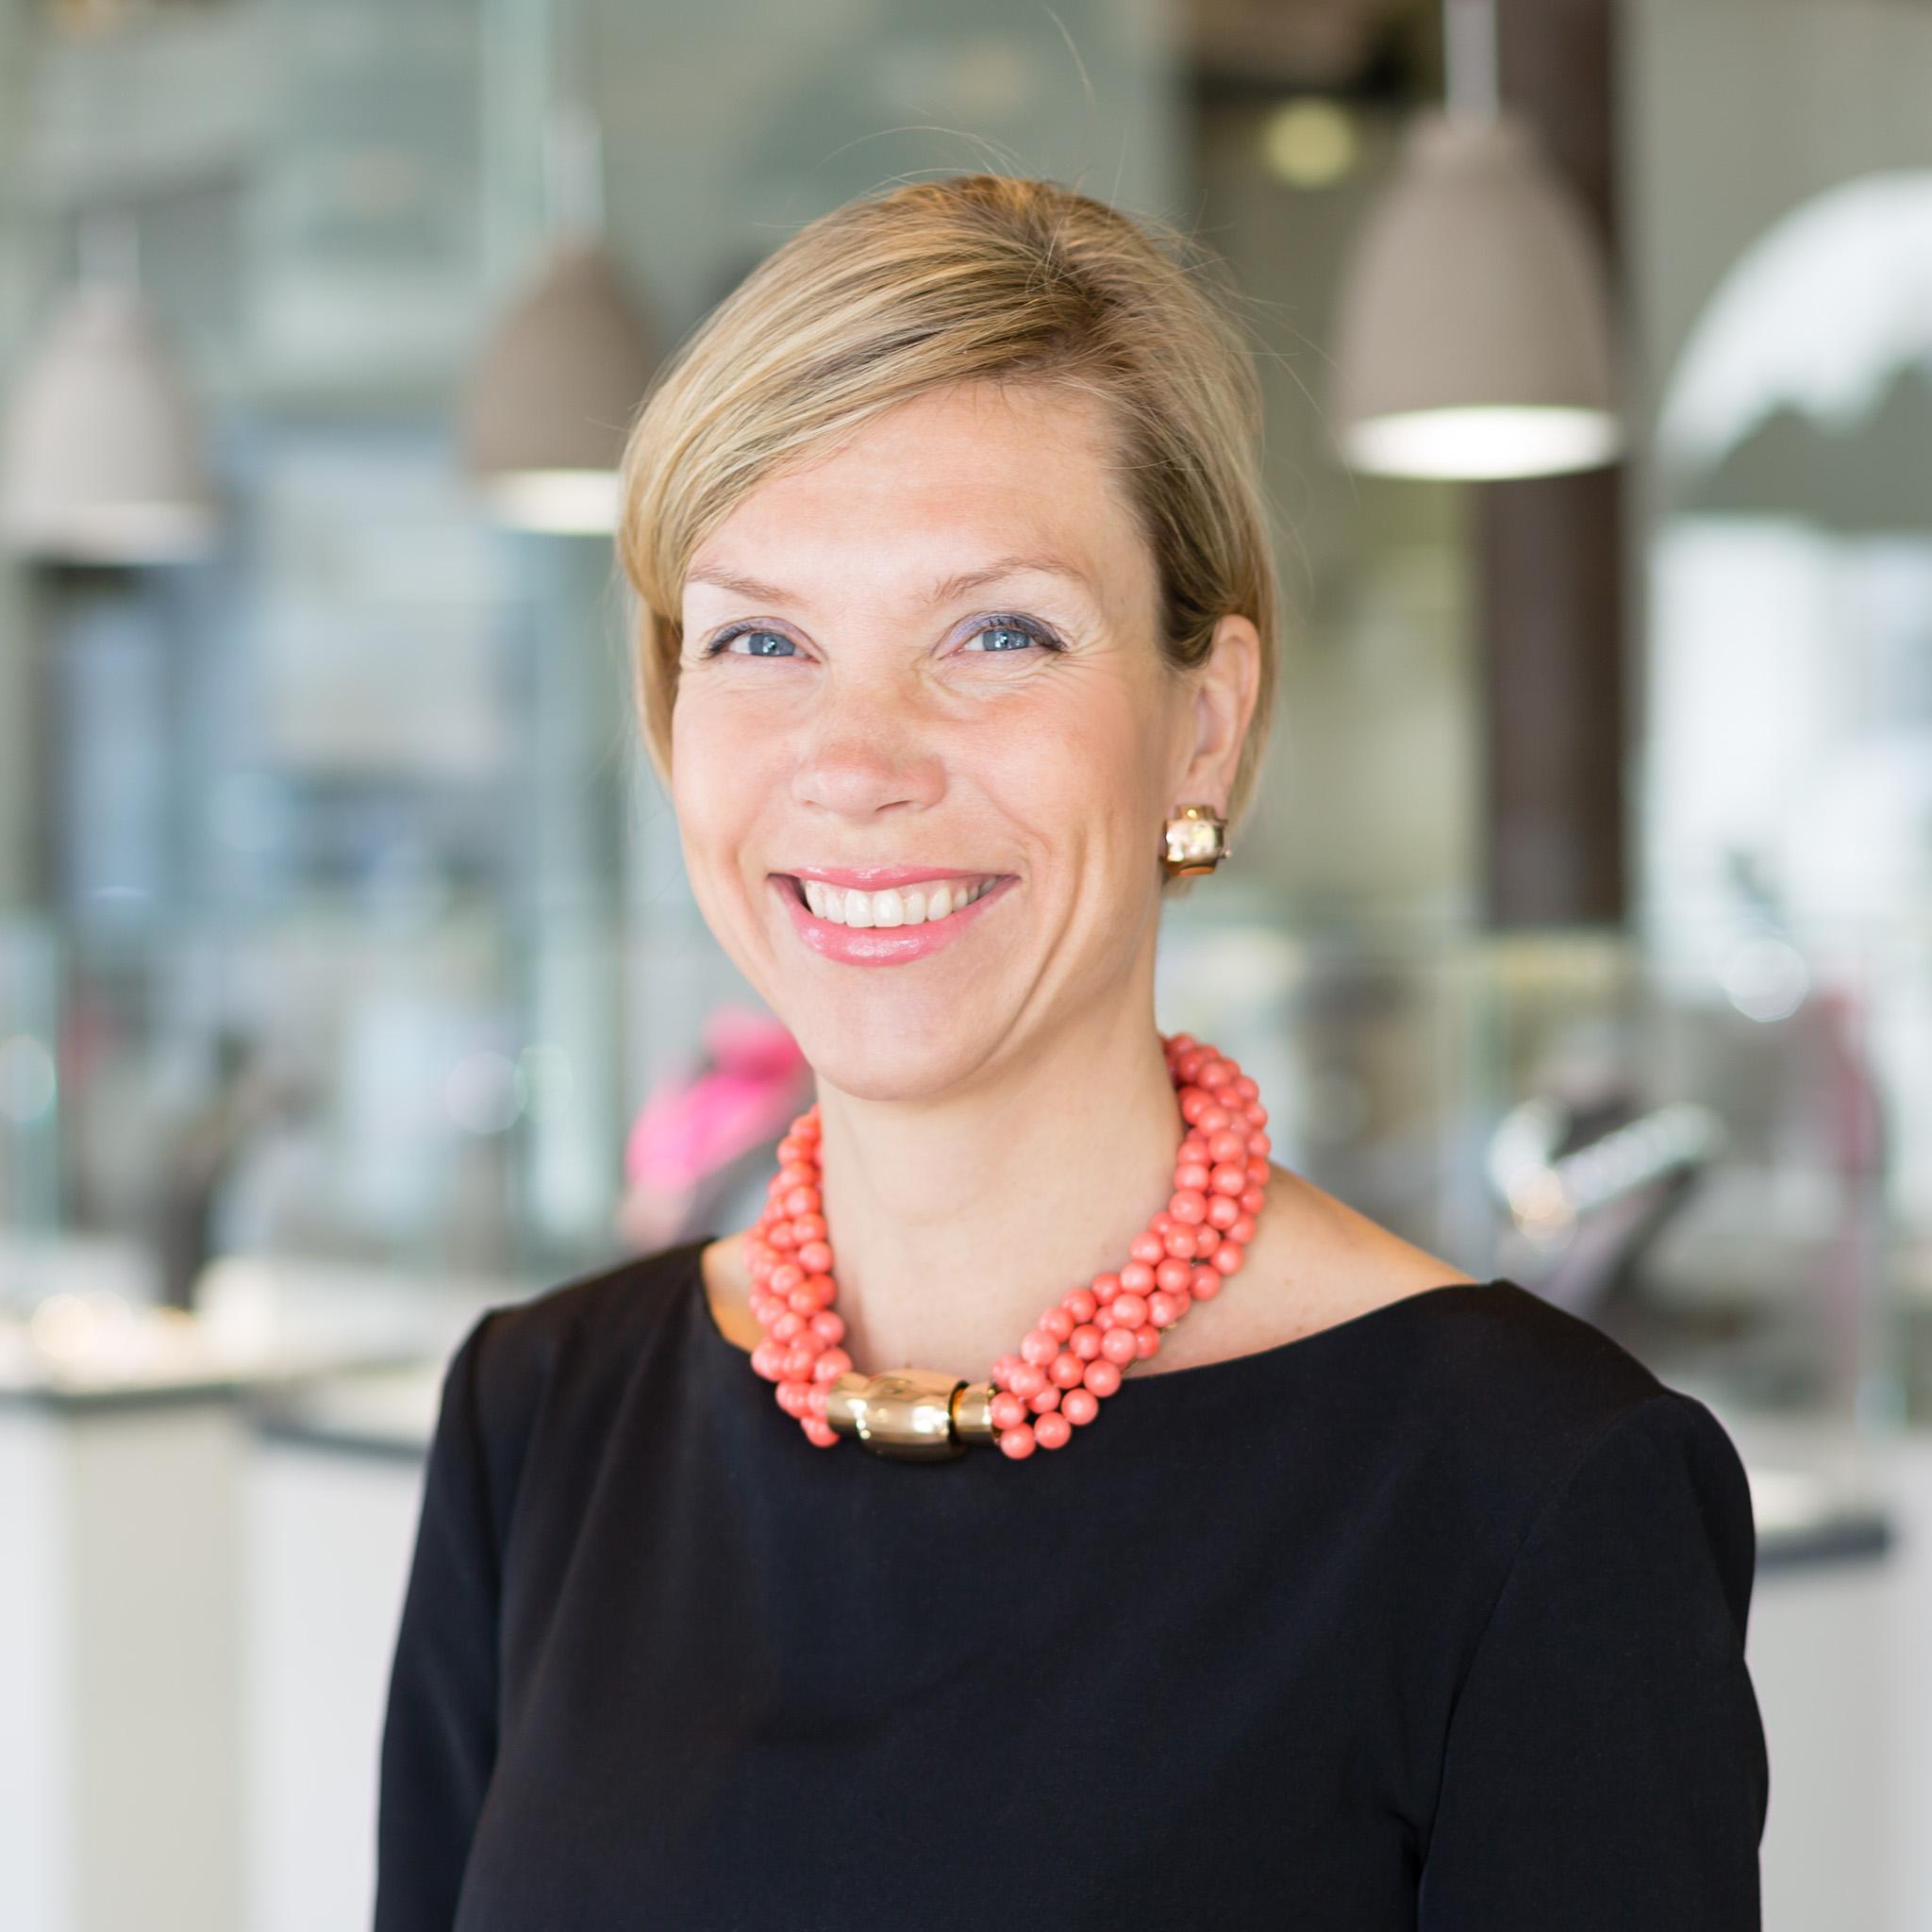 Verena Jonetat, Brigitte Bostel, Brauksiepe Goldschmiedemanufaktur,